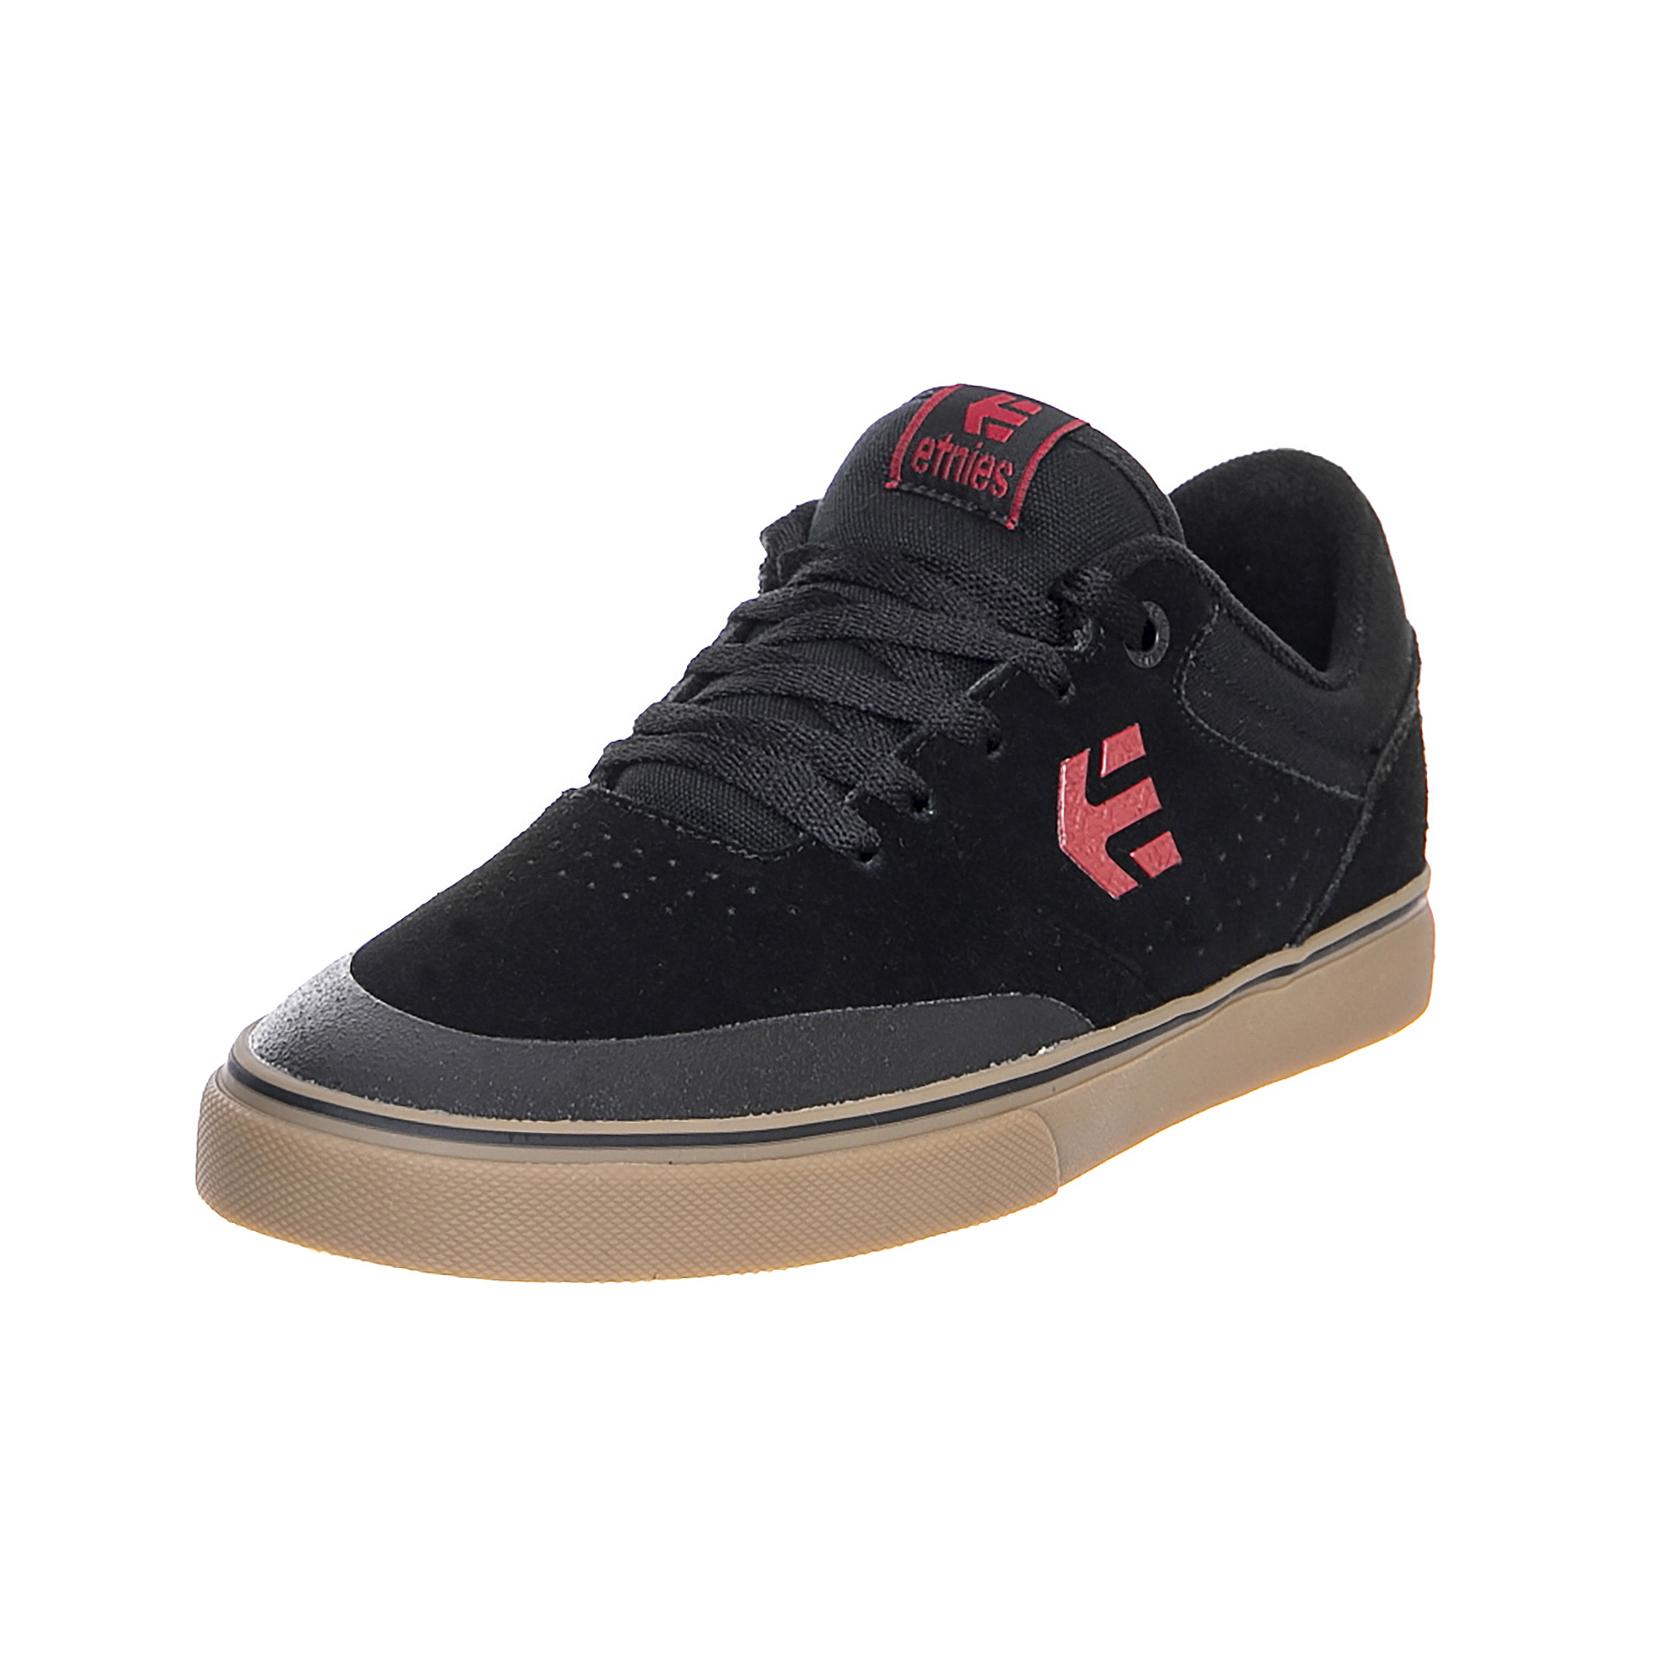 Etnies Sneakers Marana Vulc Black/Red/Gum Black